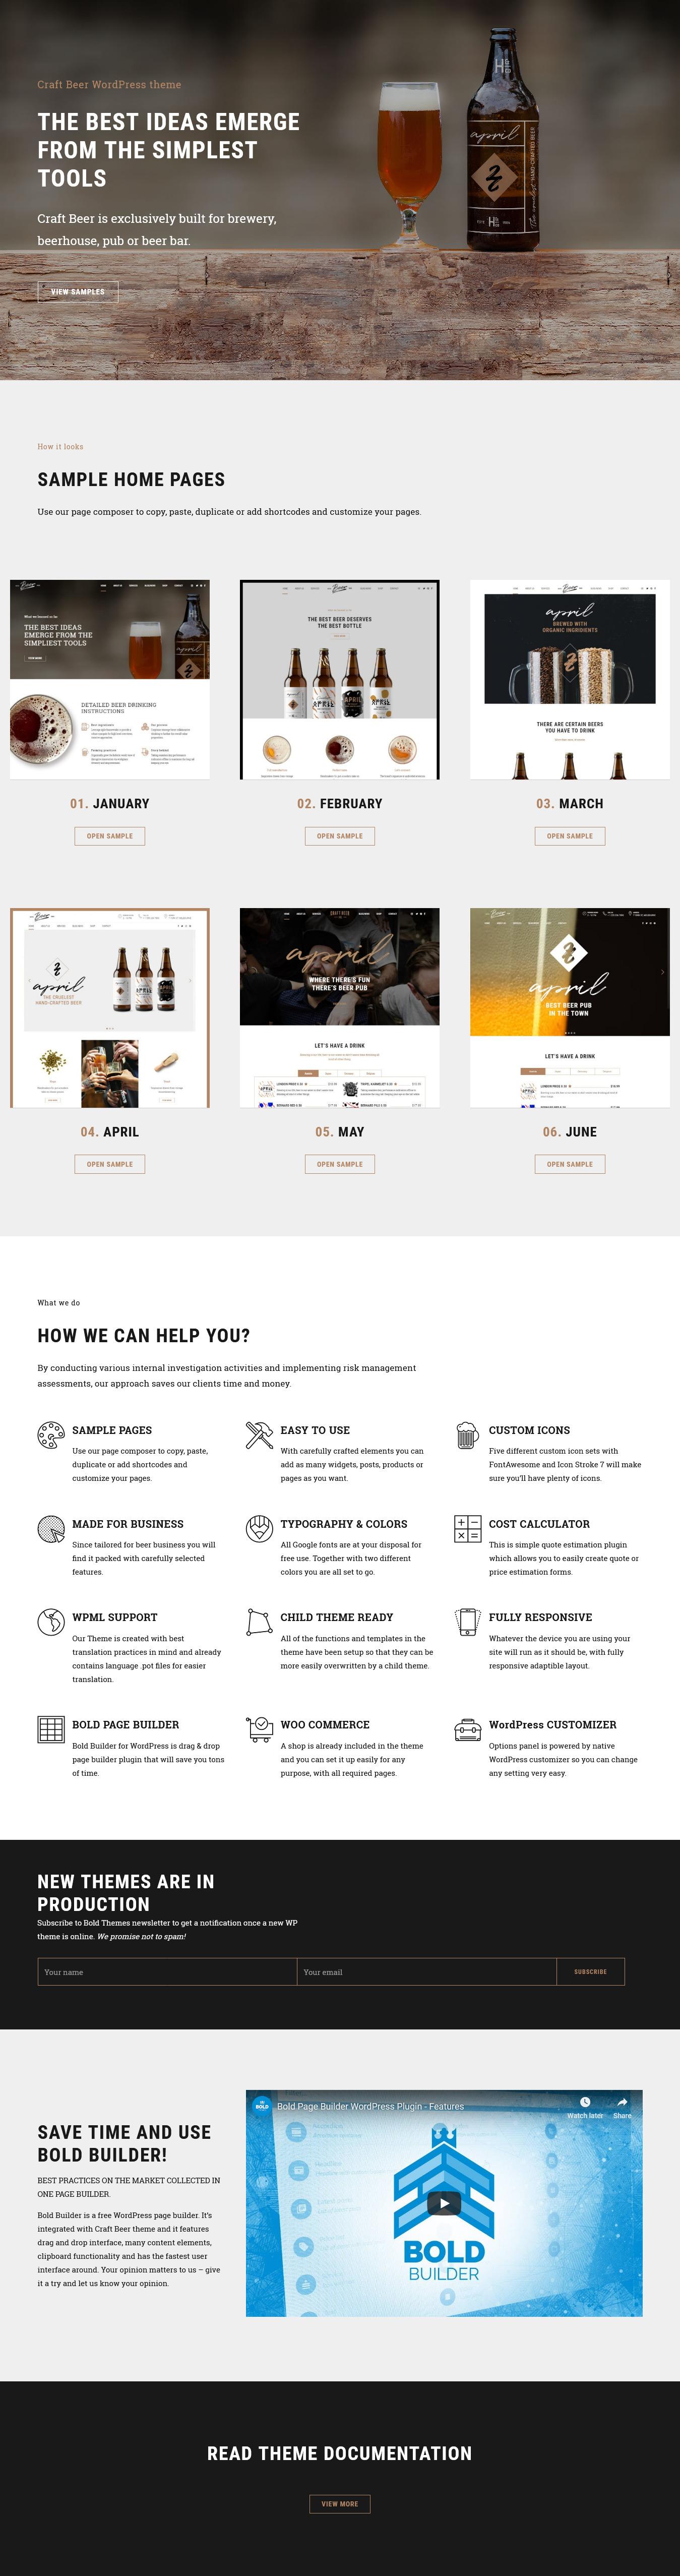 Craft Beer - Best Premium Bar and Pub WordPress Theme